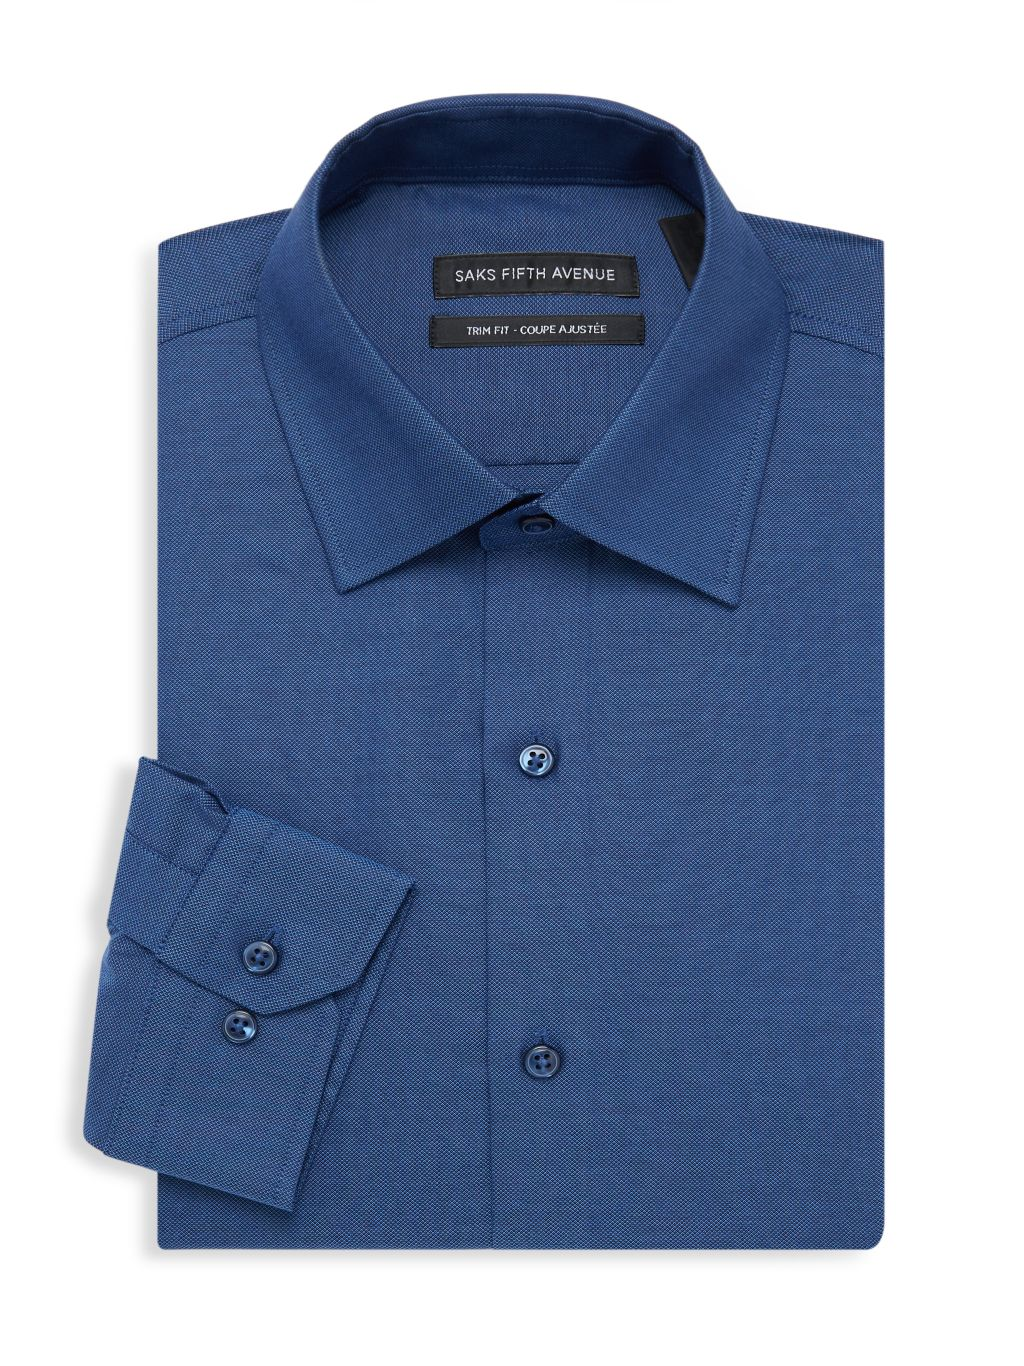 Saks Fifth Avenue Trim-Fit Oxford Dress Shirt